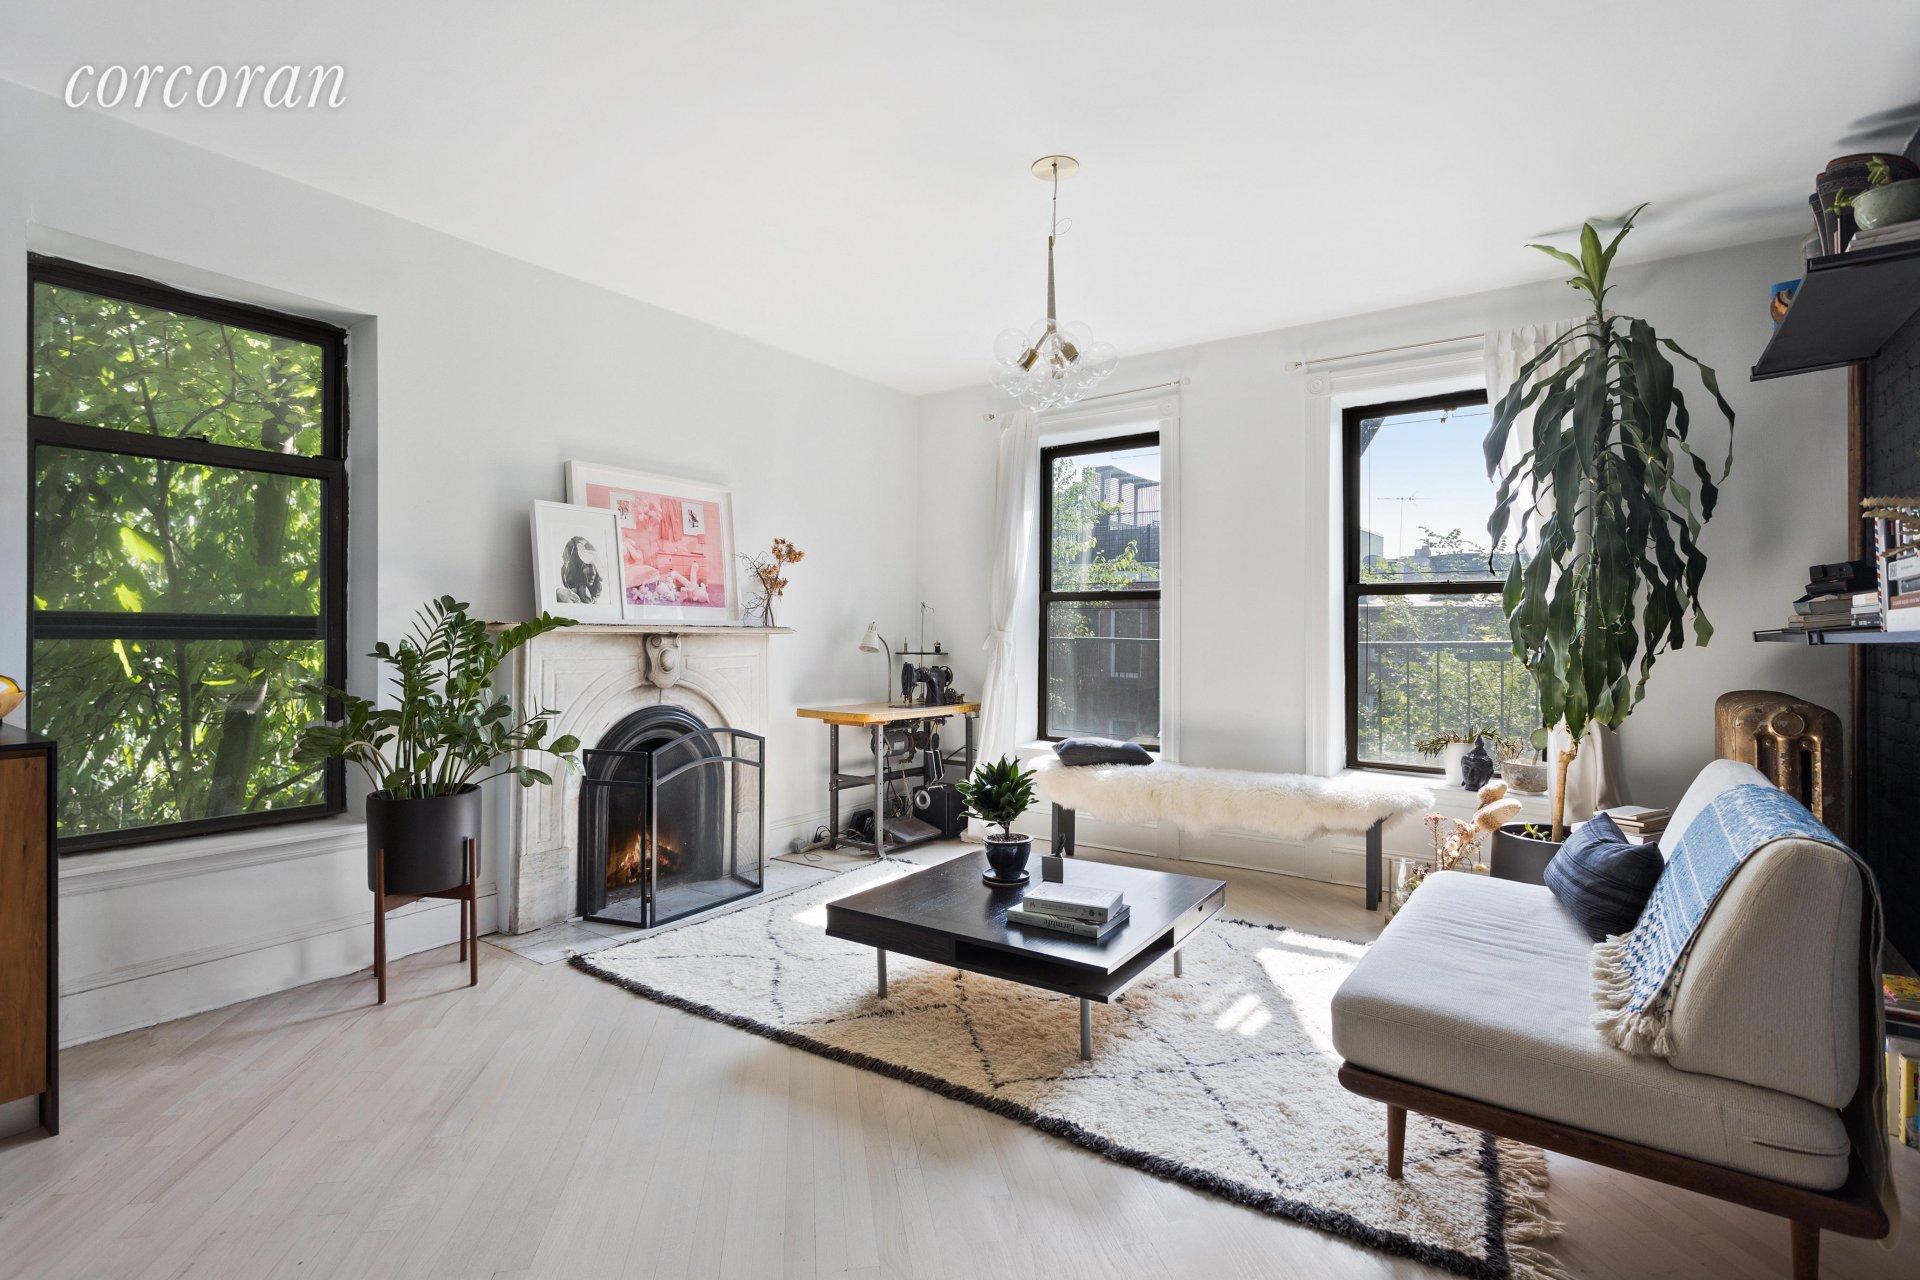 Ad Rental Apartment Brooklyn (11238) ref:5826053